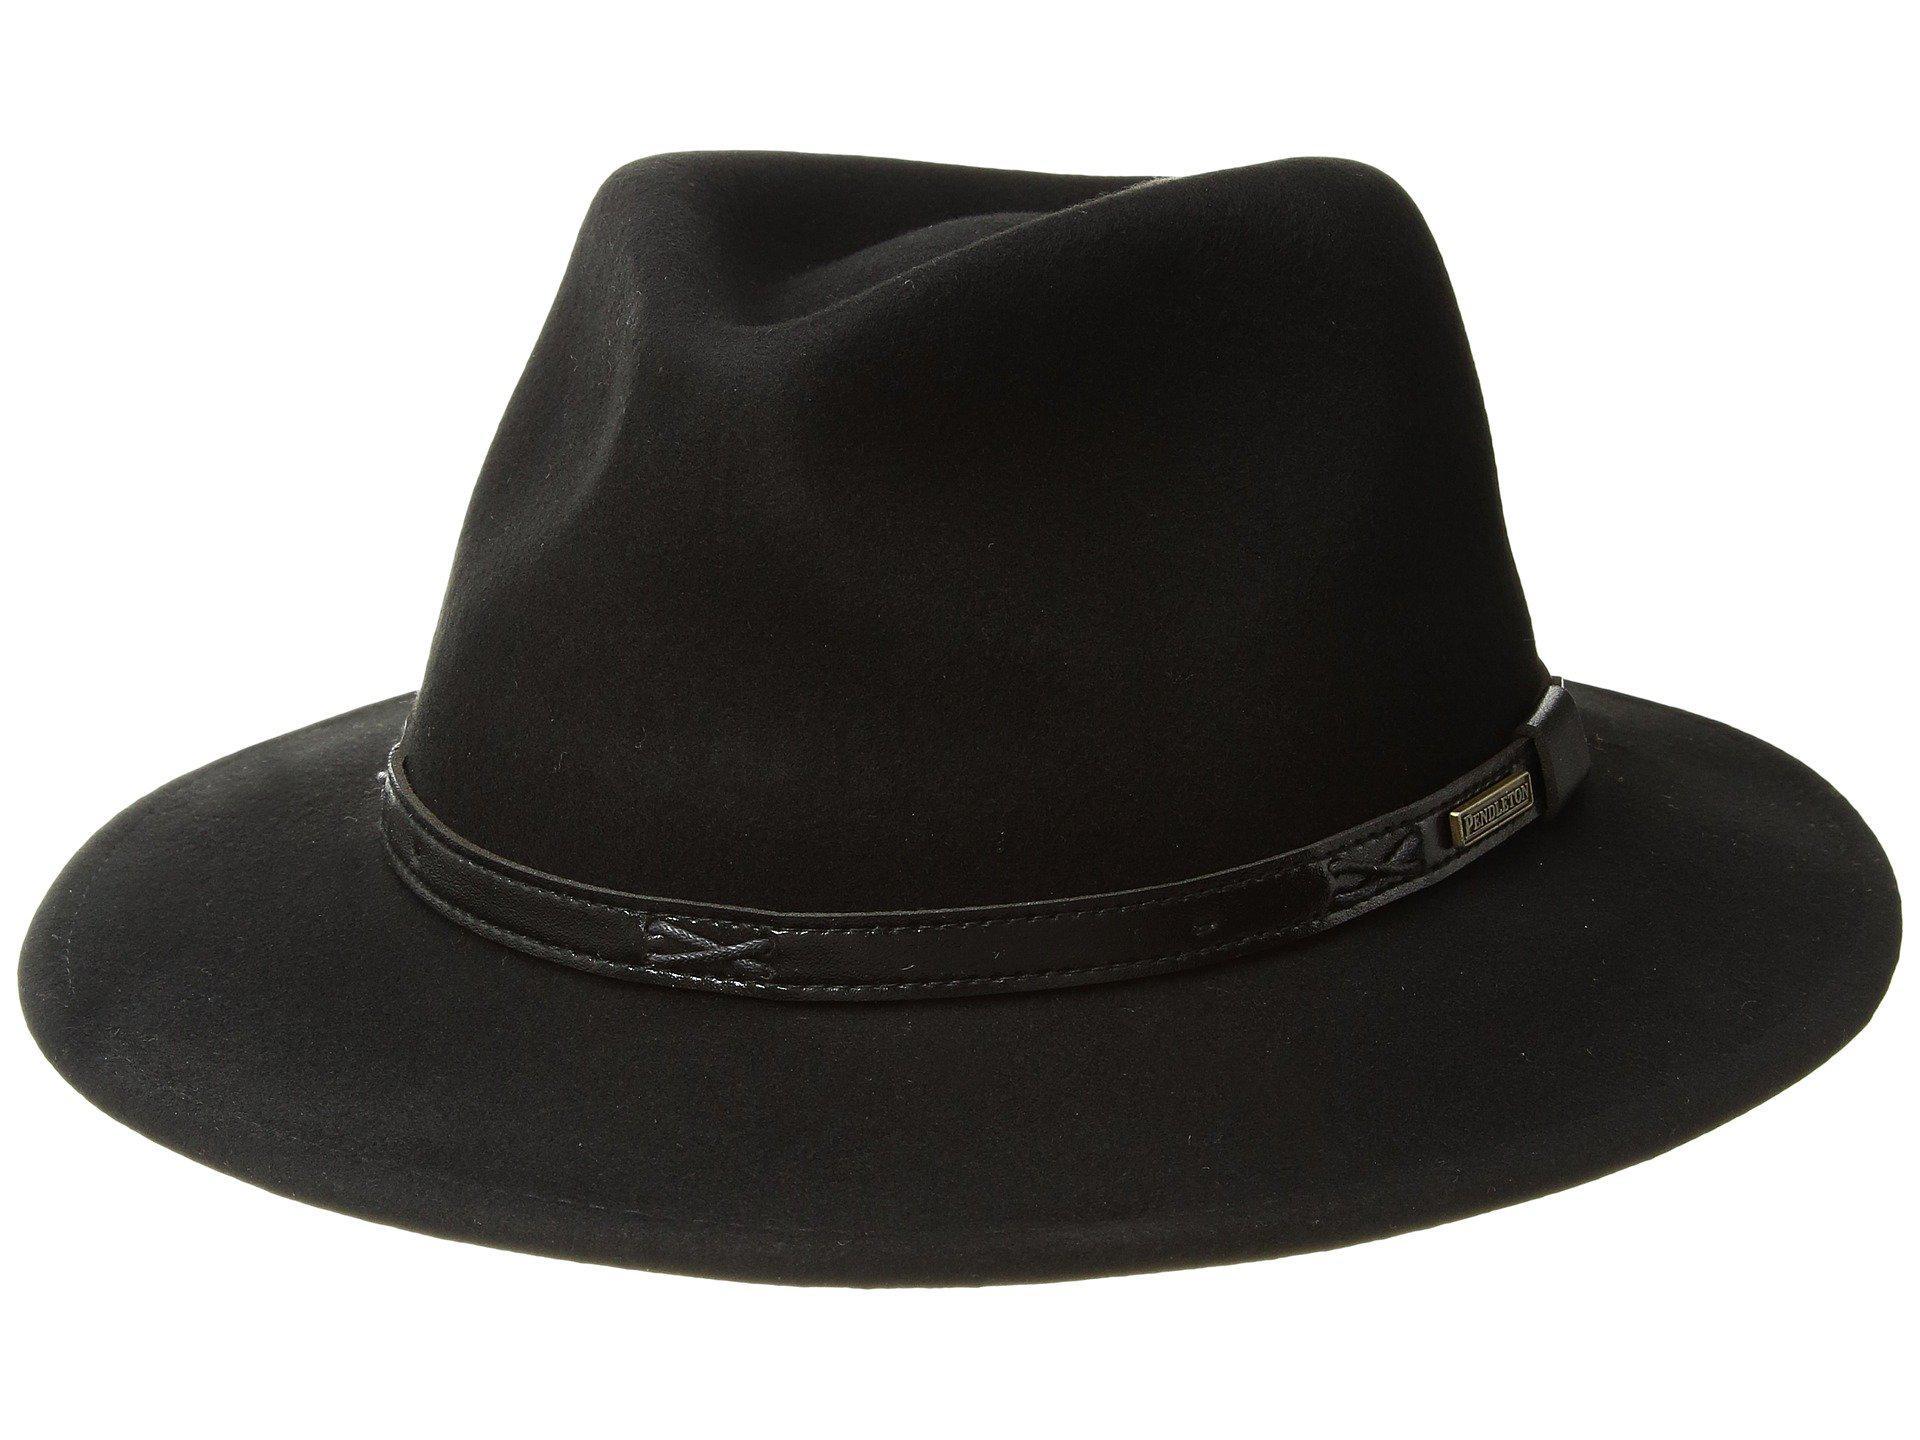 2419fe5a4e4 Lyst - Pendleton Indiana Hat in Black for Men